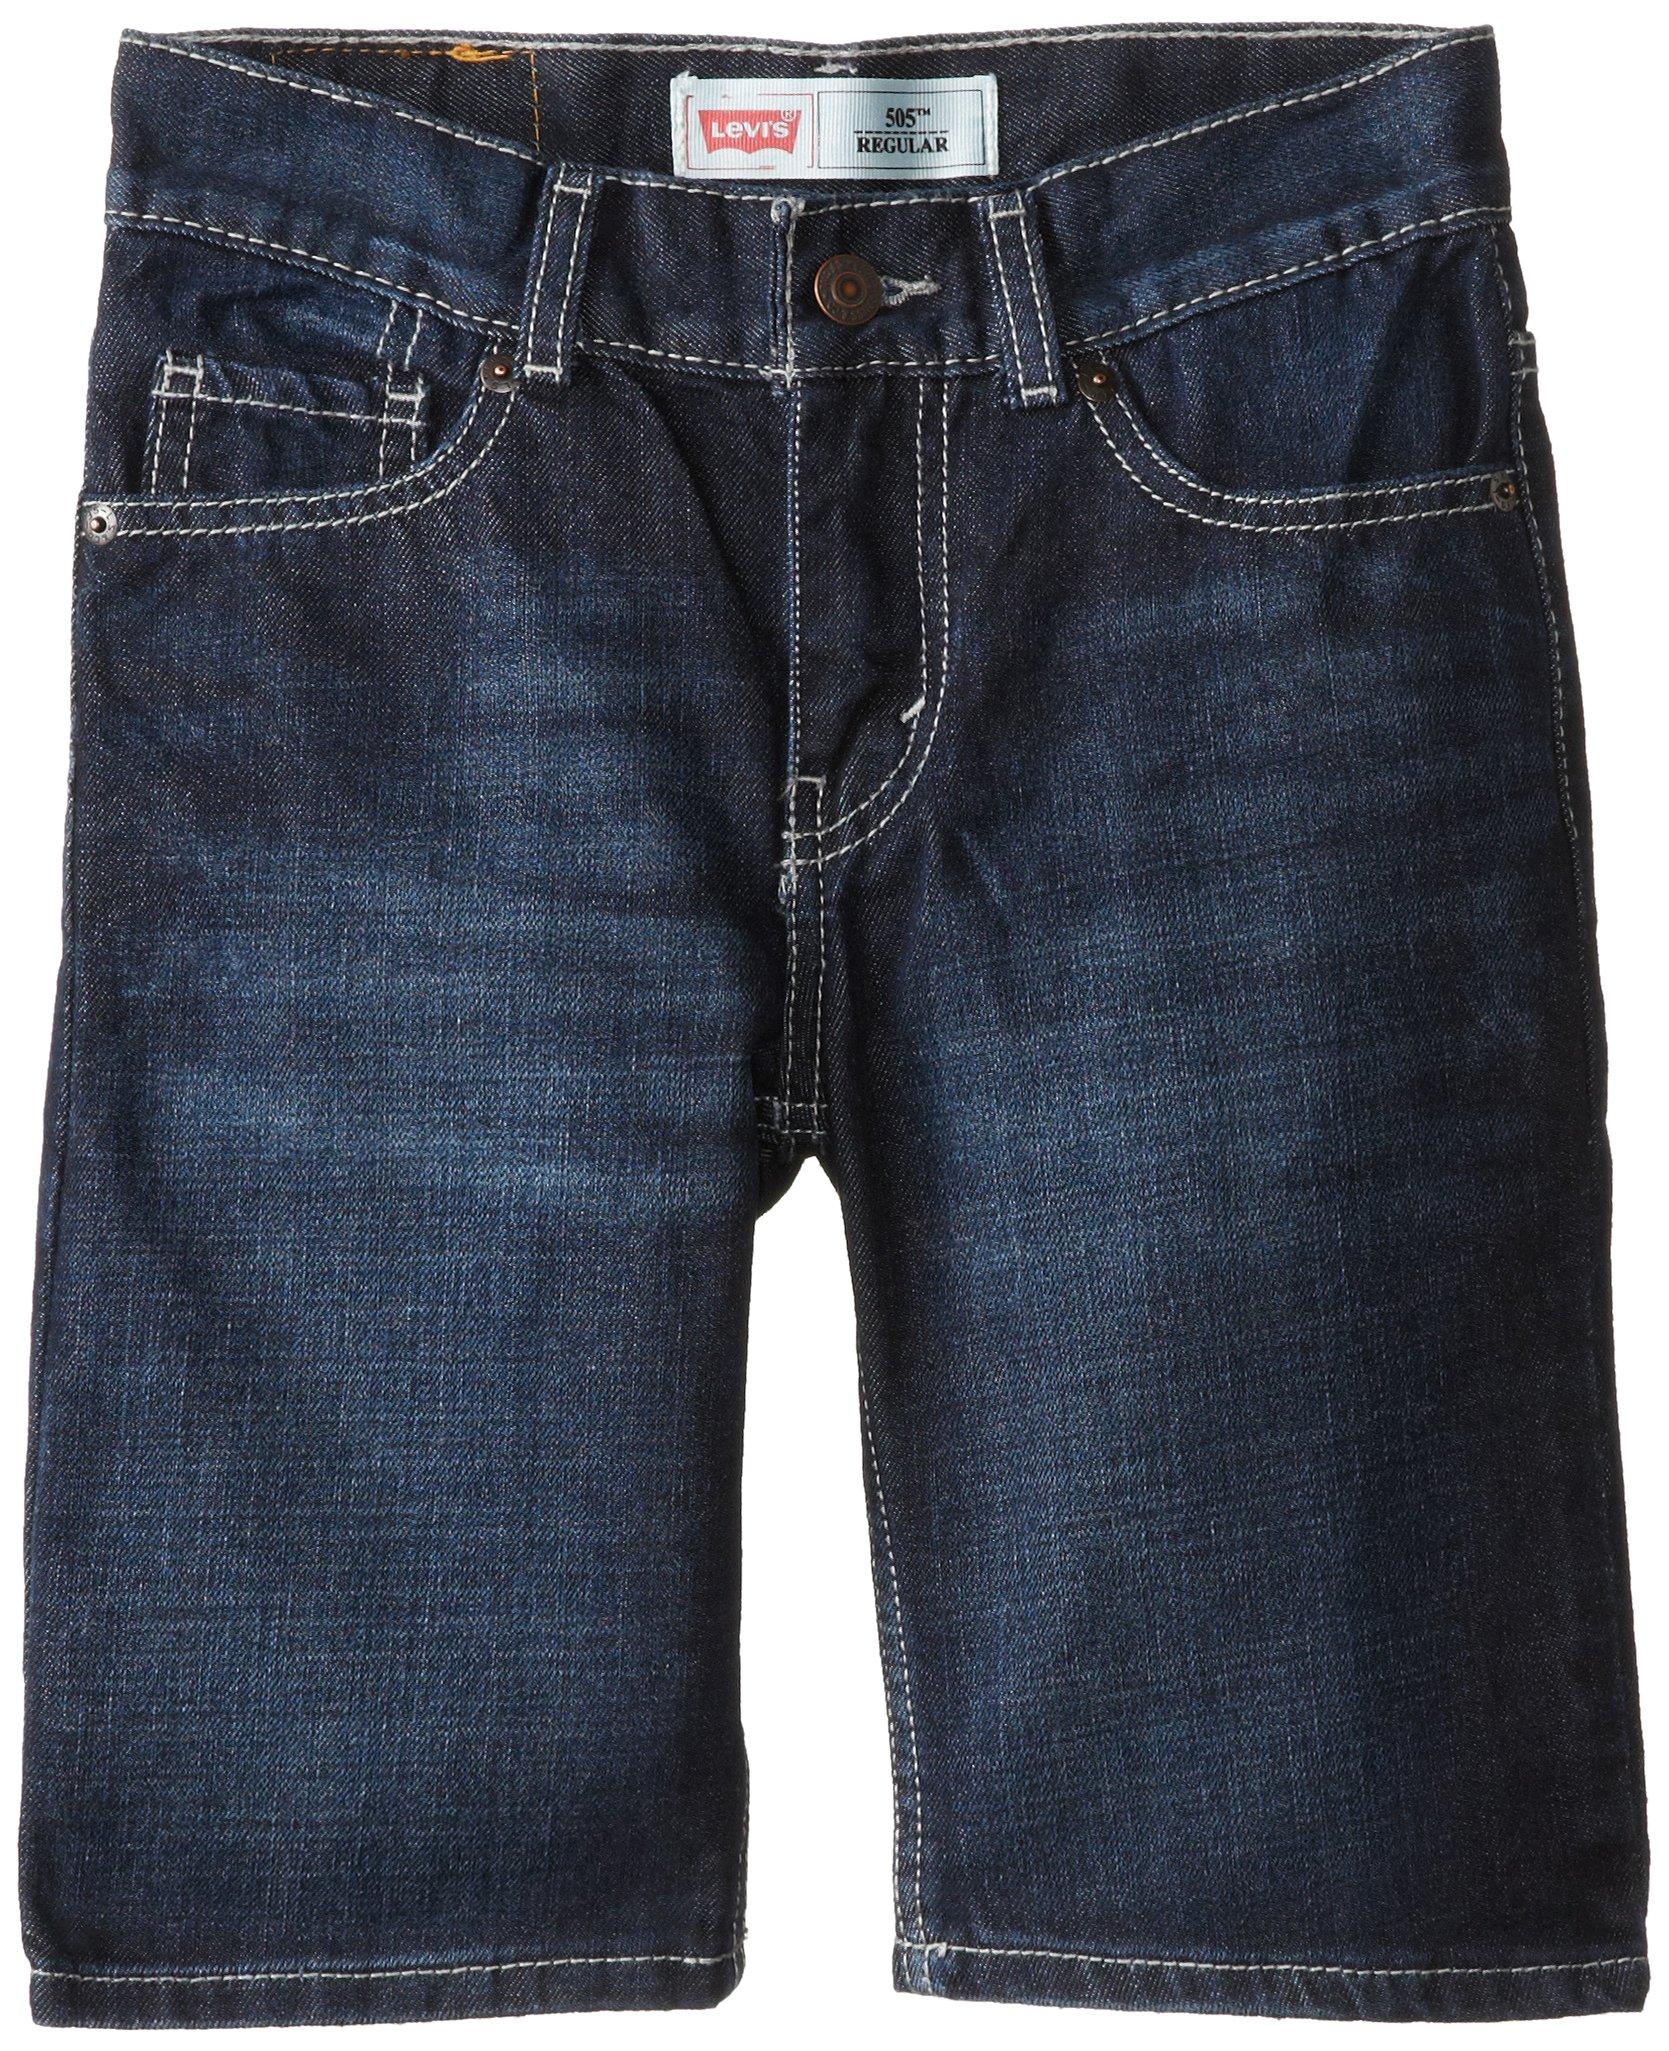 Levi's Big Boys' 505 Regular Fit Denim Shorts, Thorne, 10